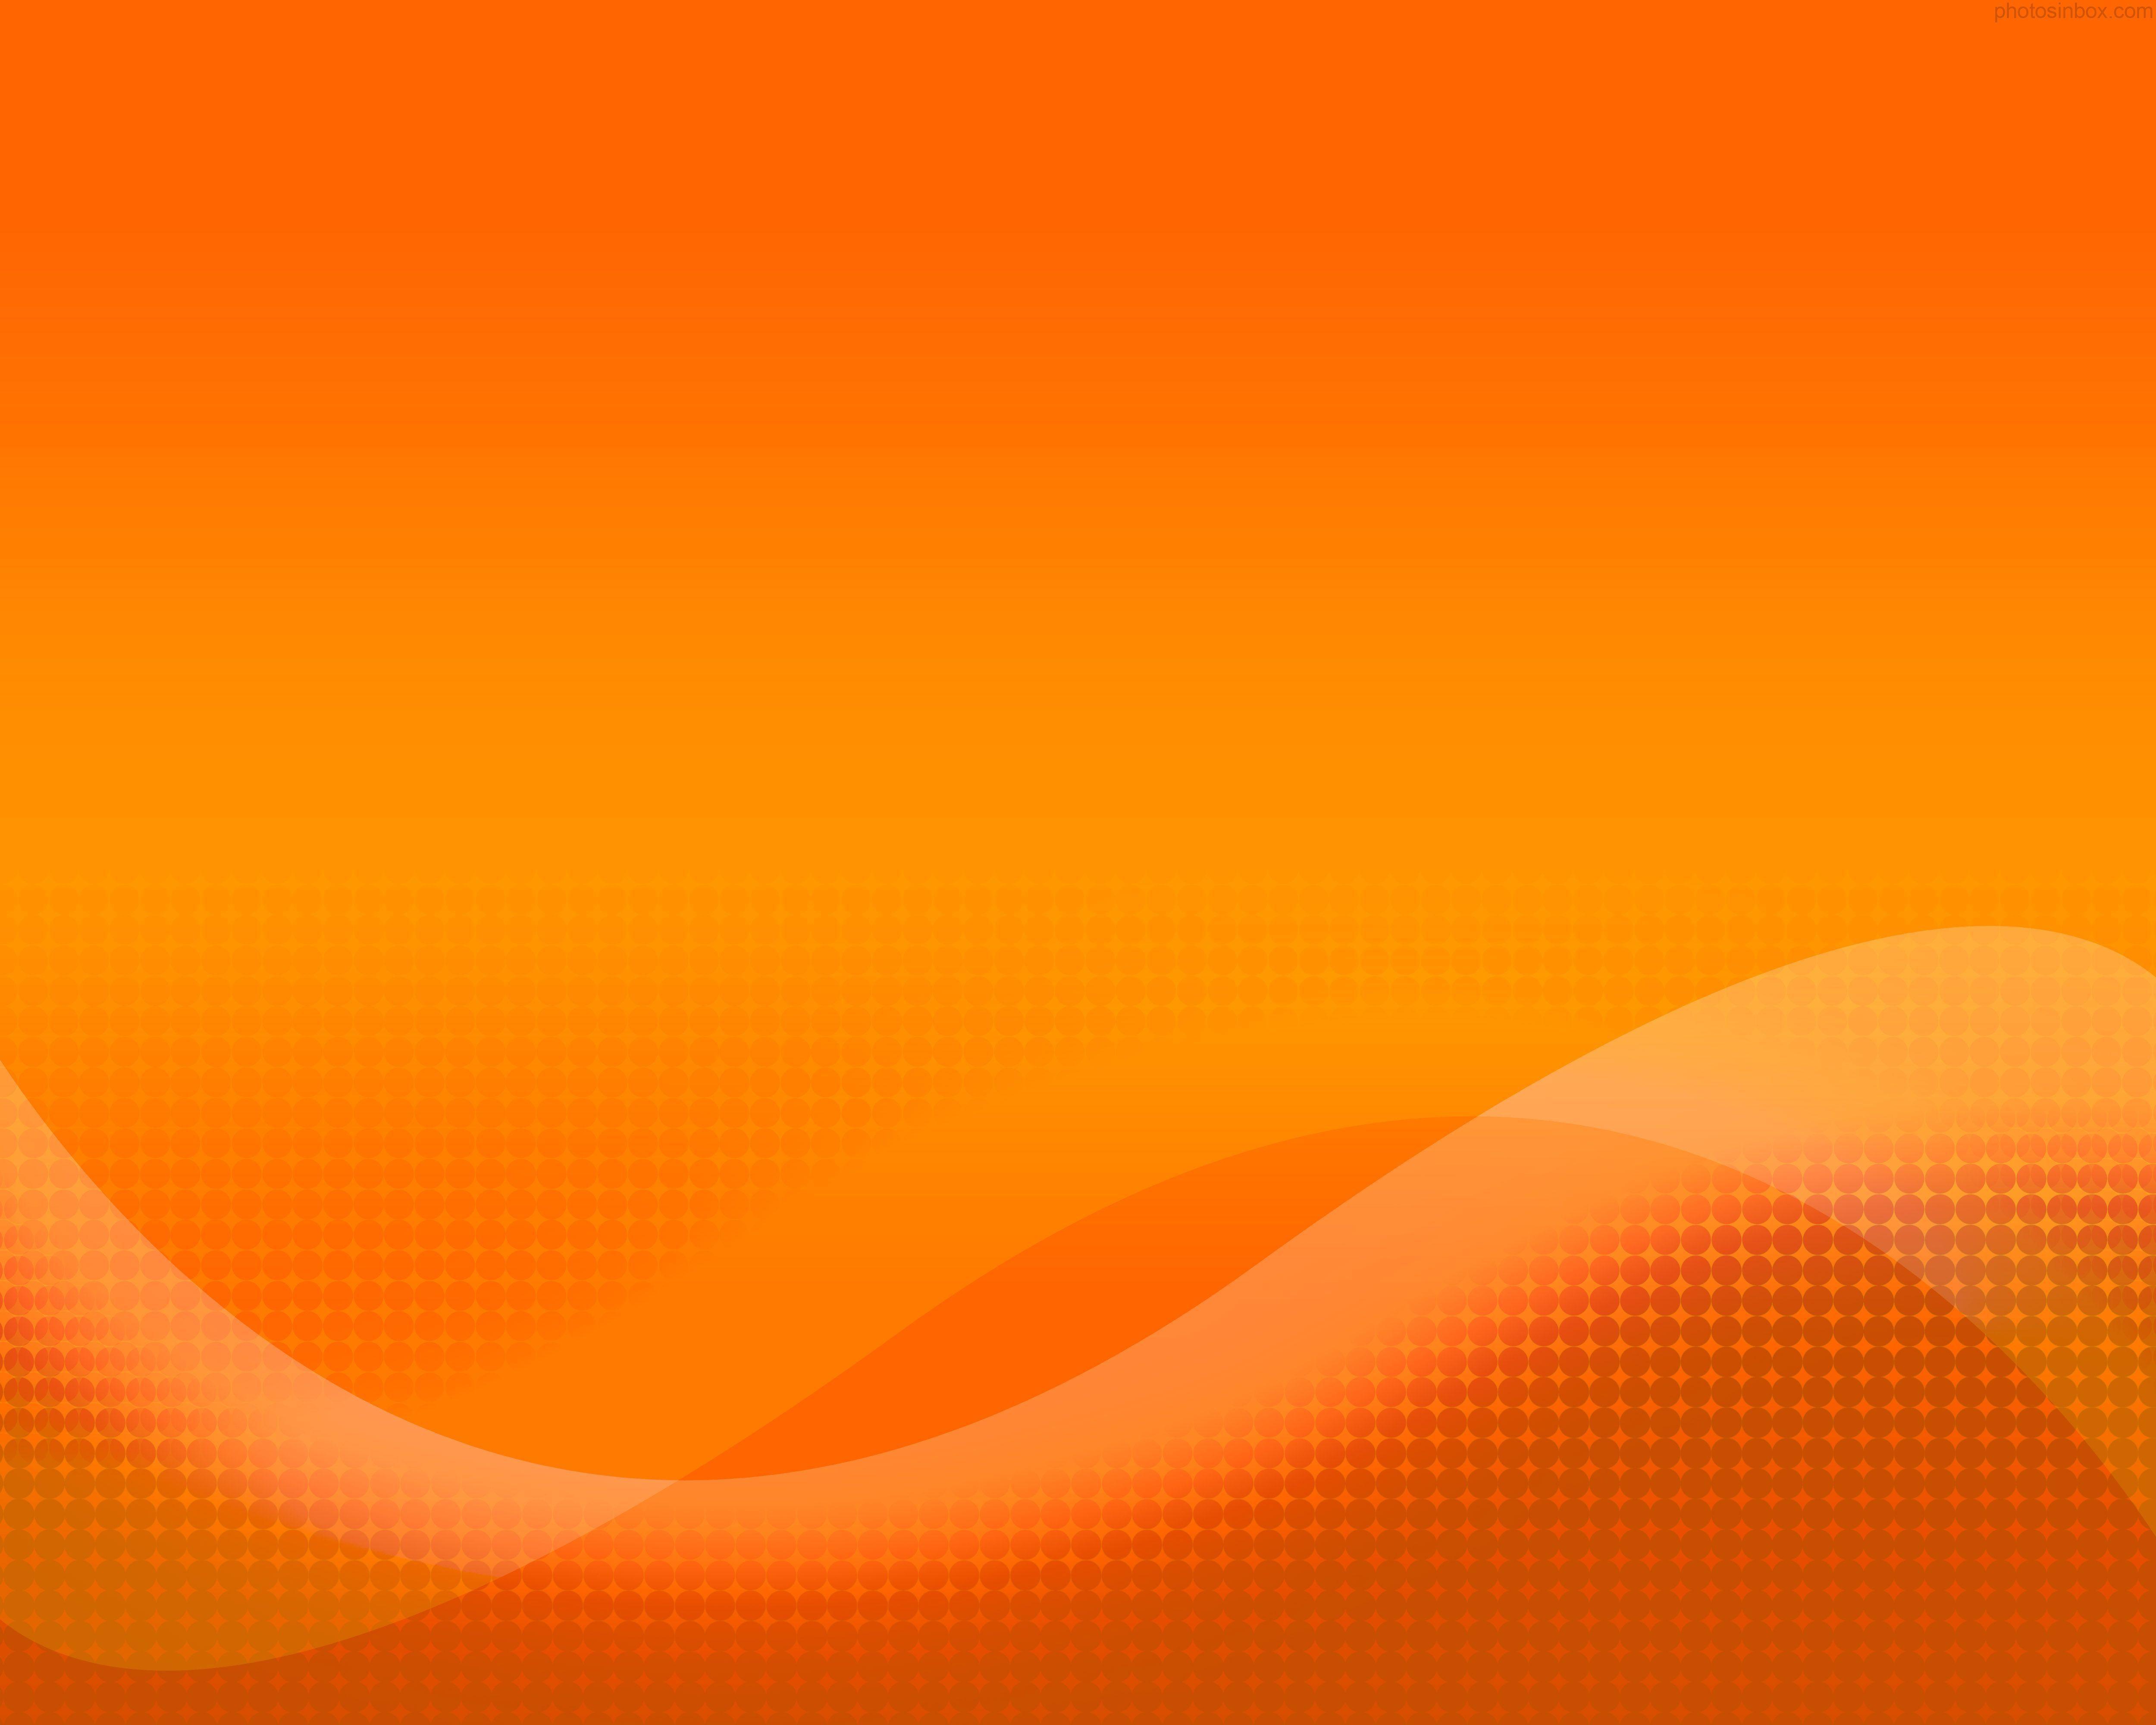 Abstract Orange Backgrounds Psdgraphics Orange Wallpaper Orange Background Background